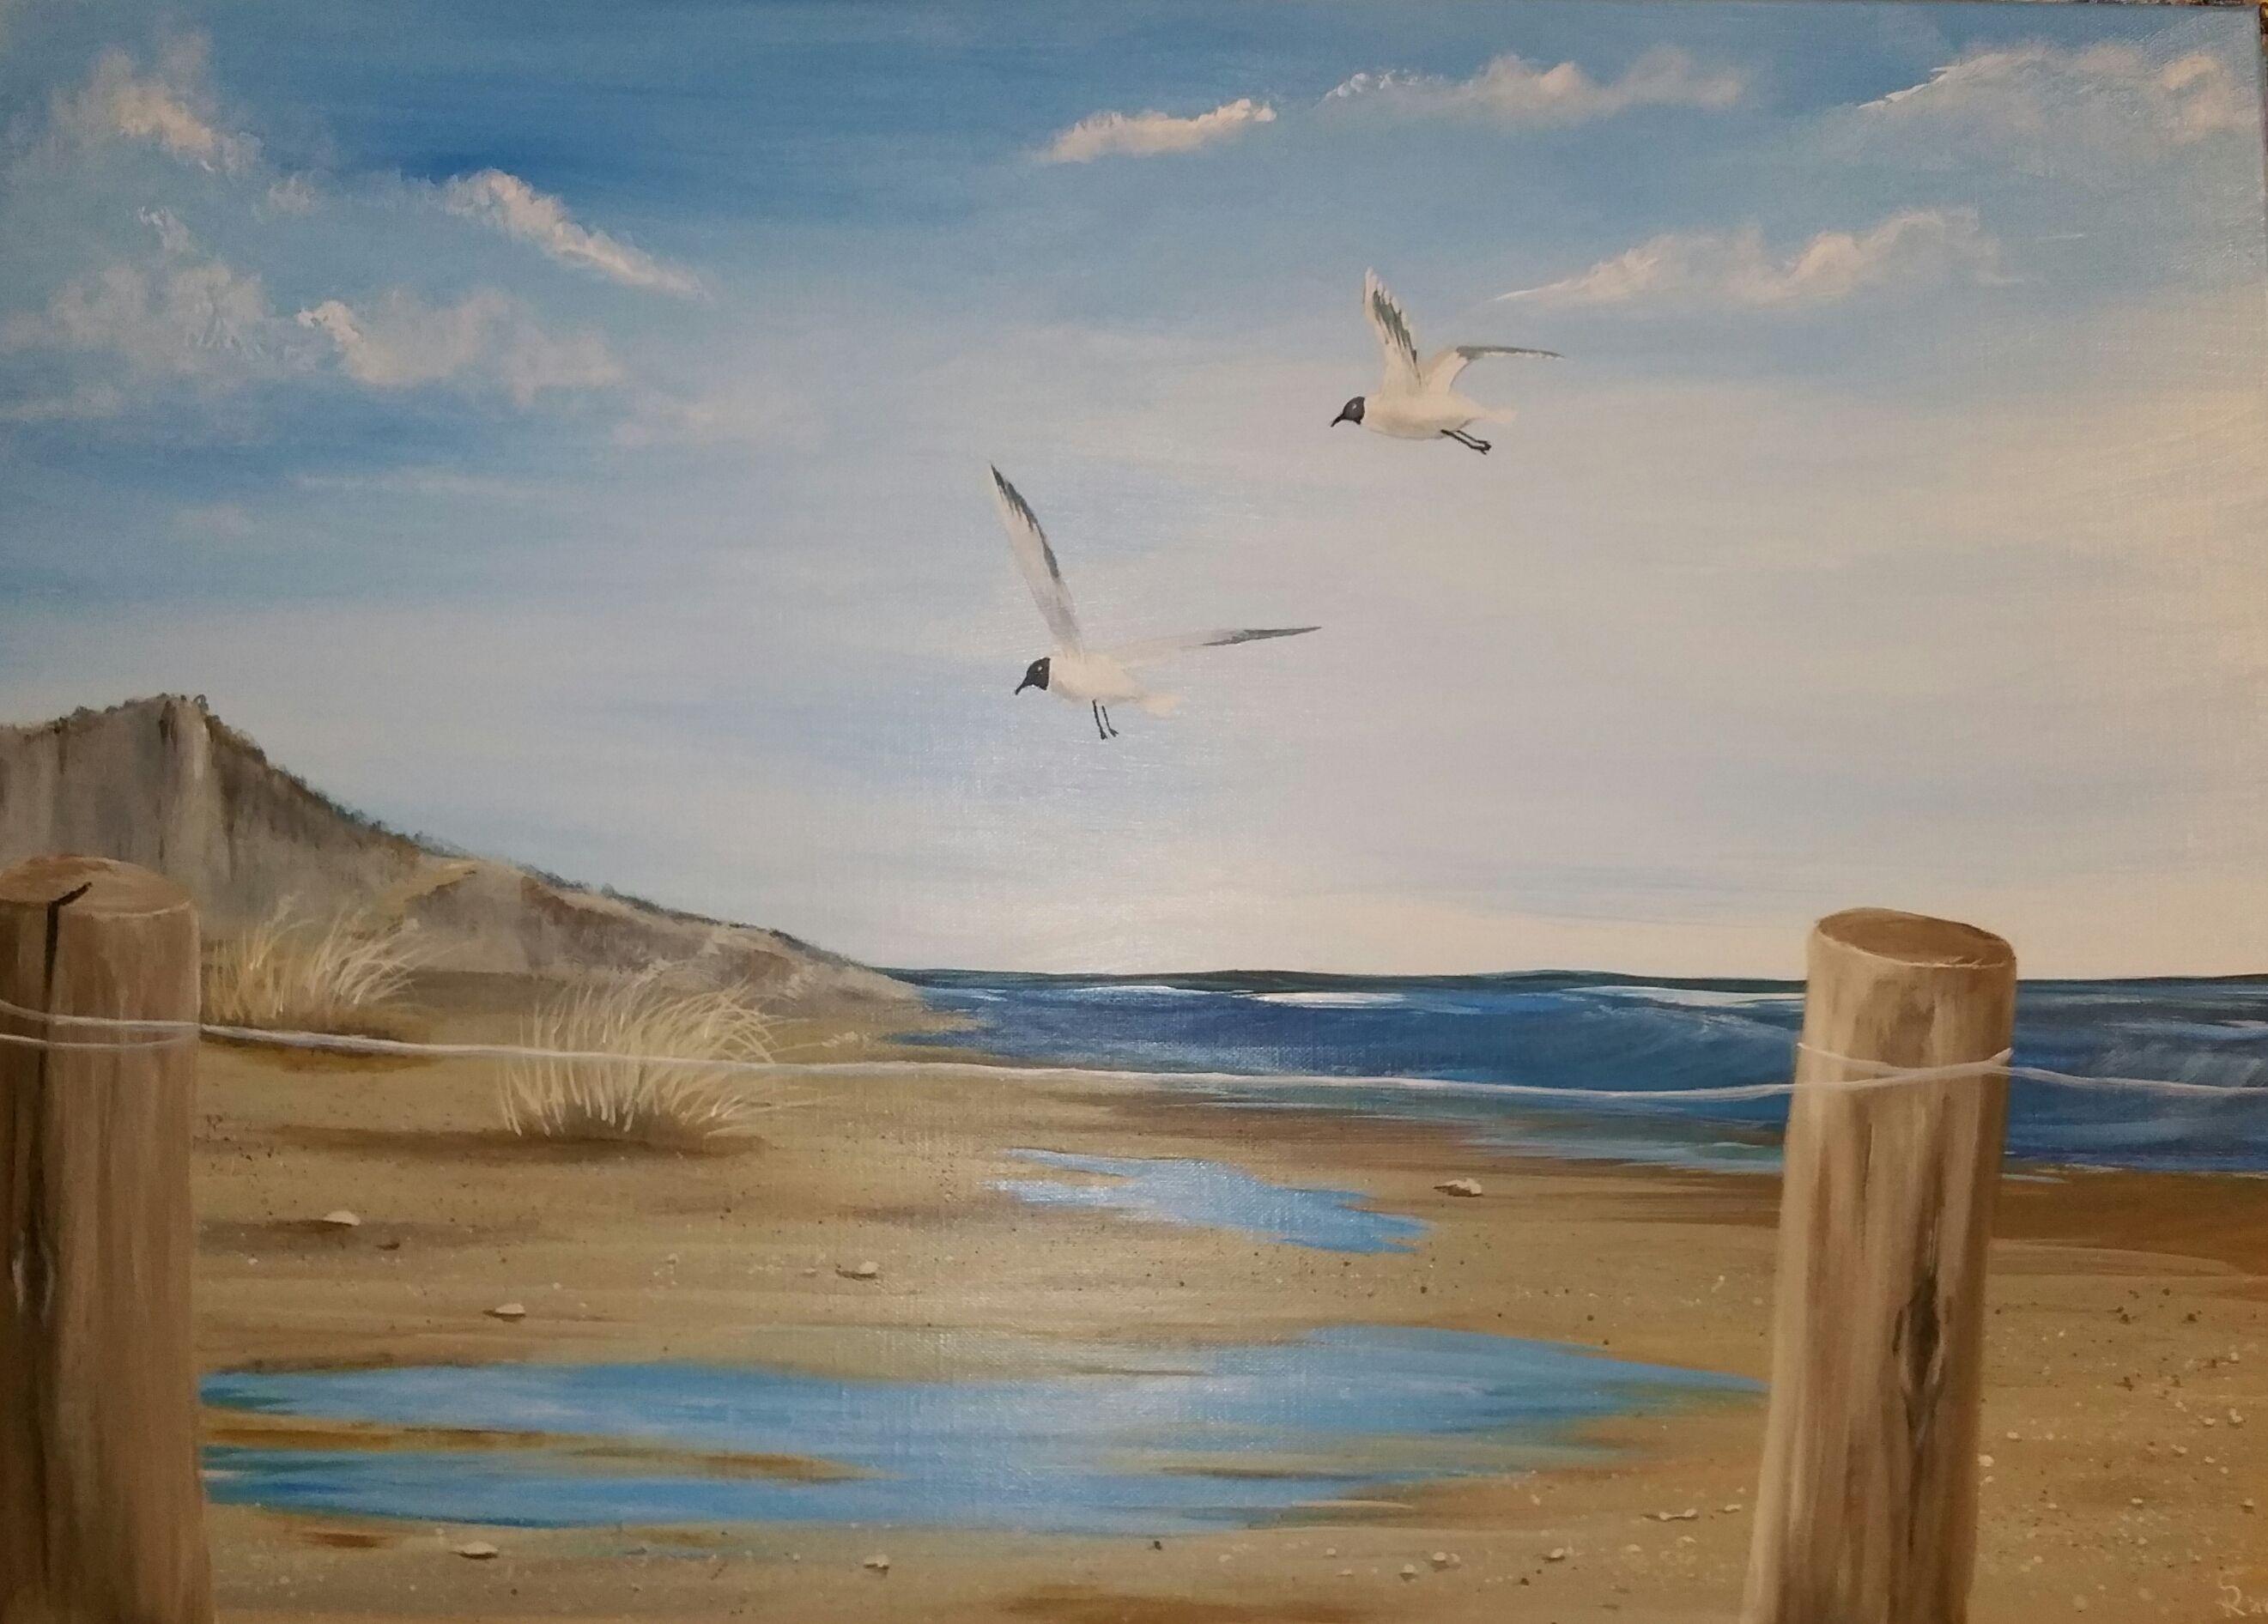 Acrylmalerei Auf Leinwand Strand Vogel Das Meer Acryl Kunstproduktion Acrylmalerei